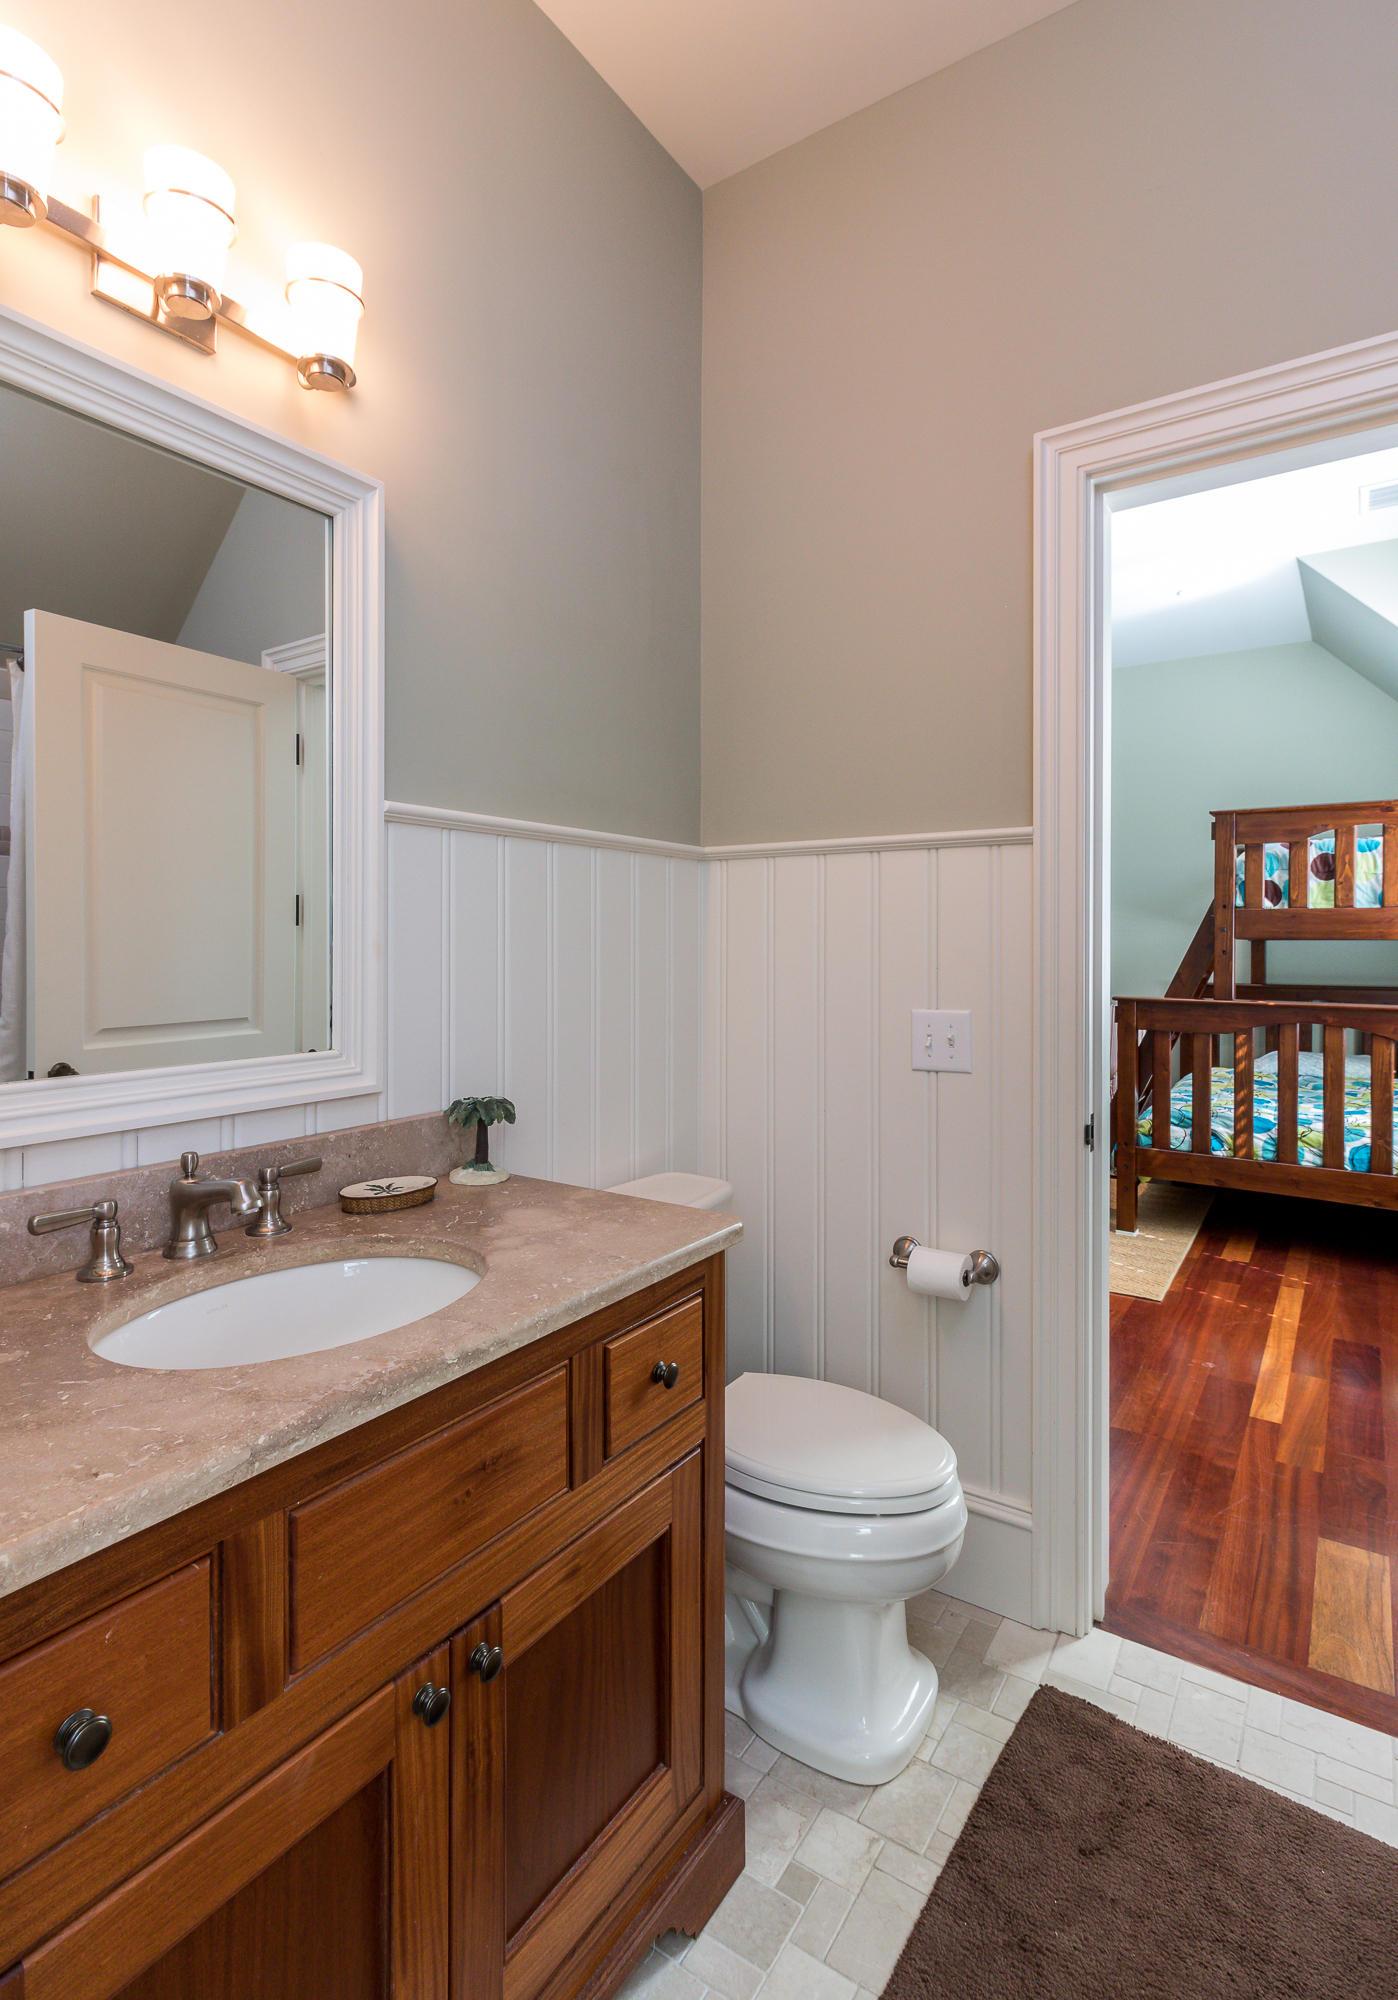 Egret/Pintail Homes For Sale - 117 Bufflehead, Kiawah Island, SC - 22